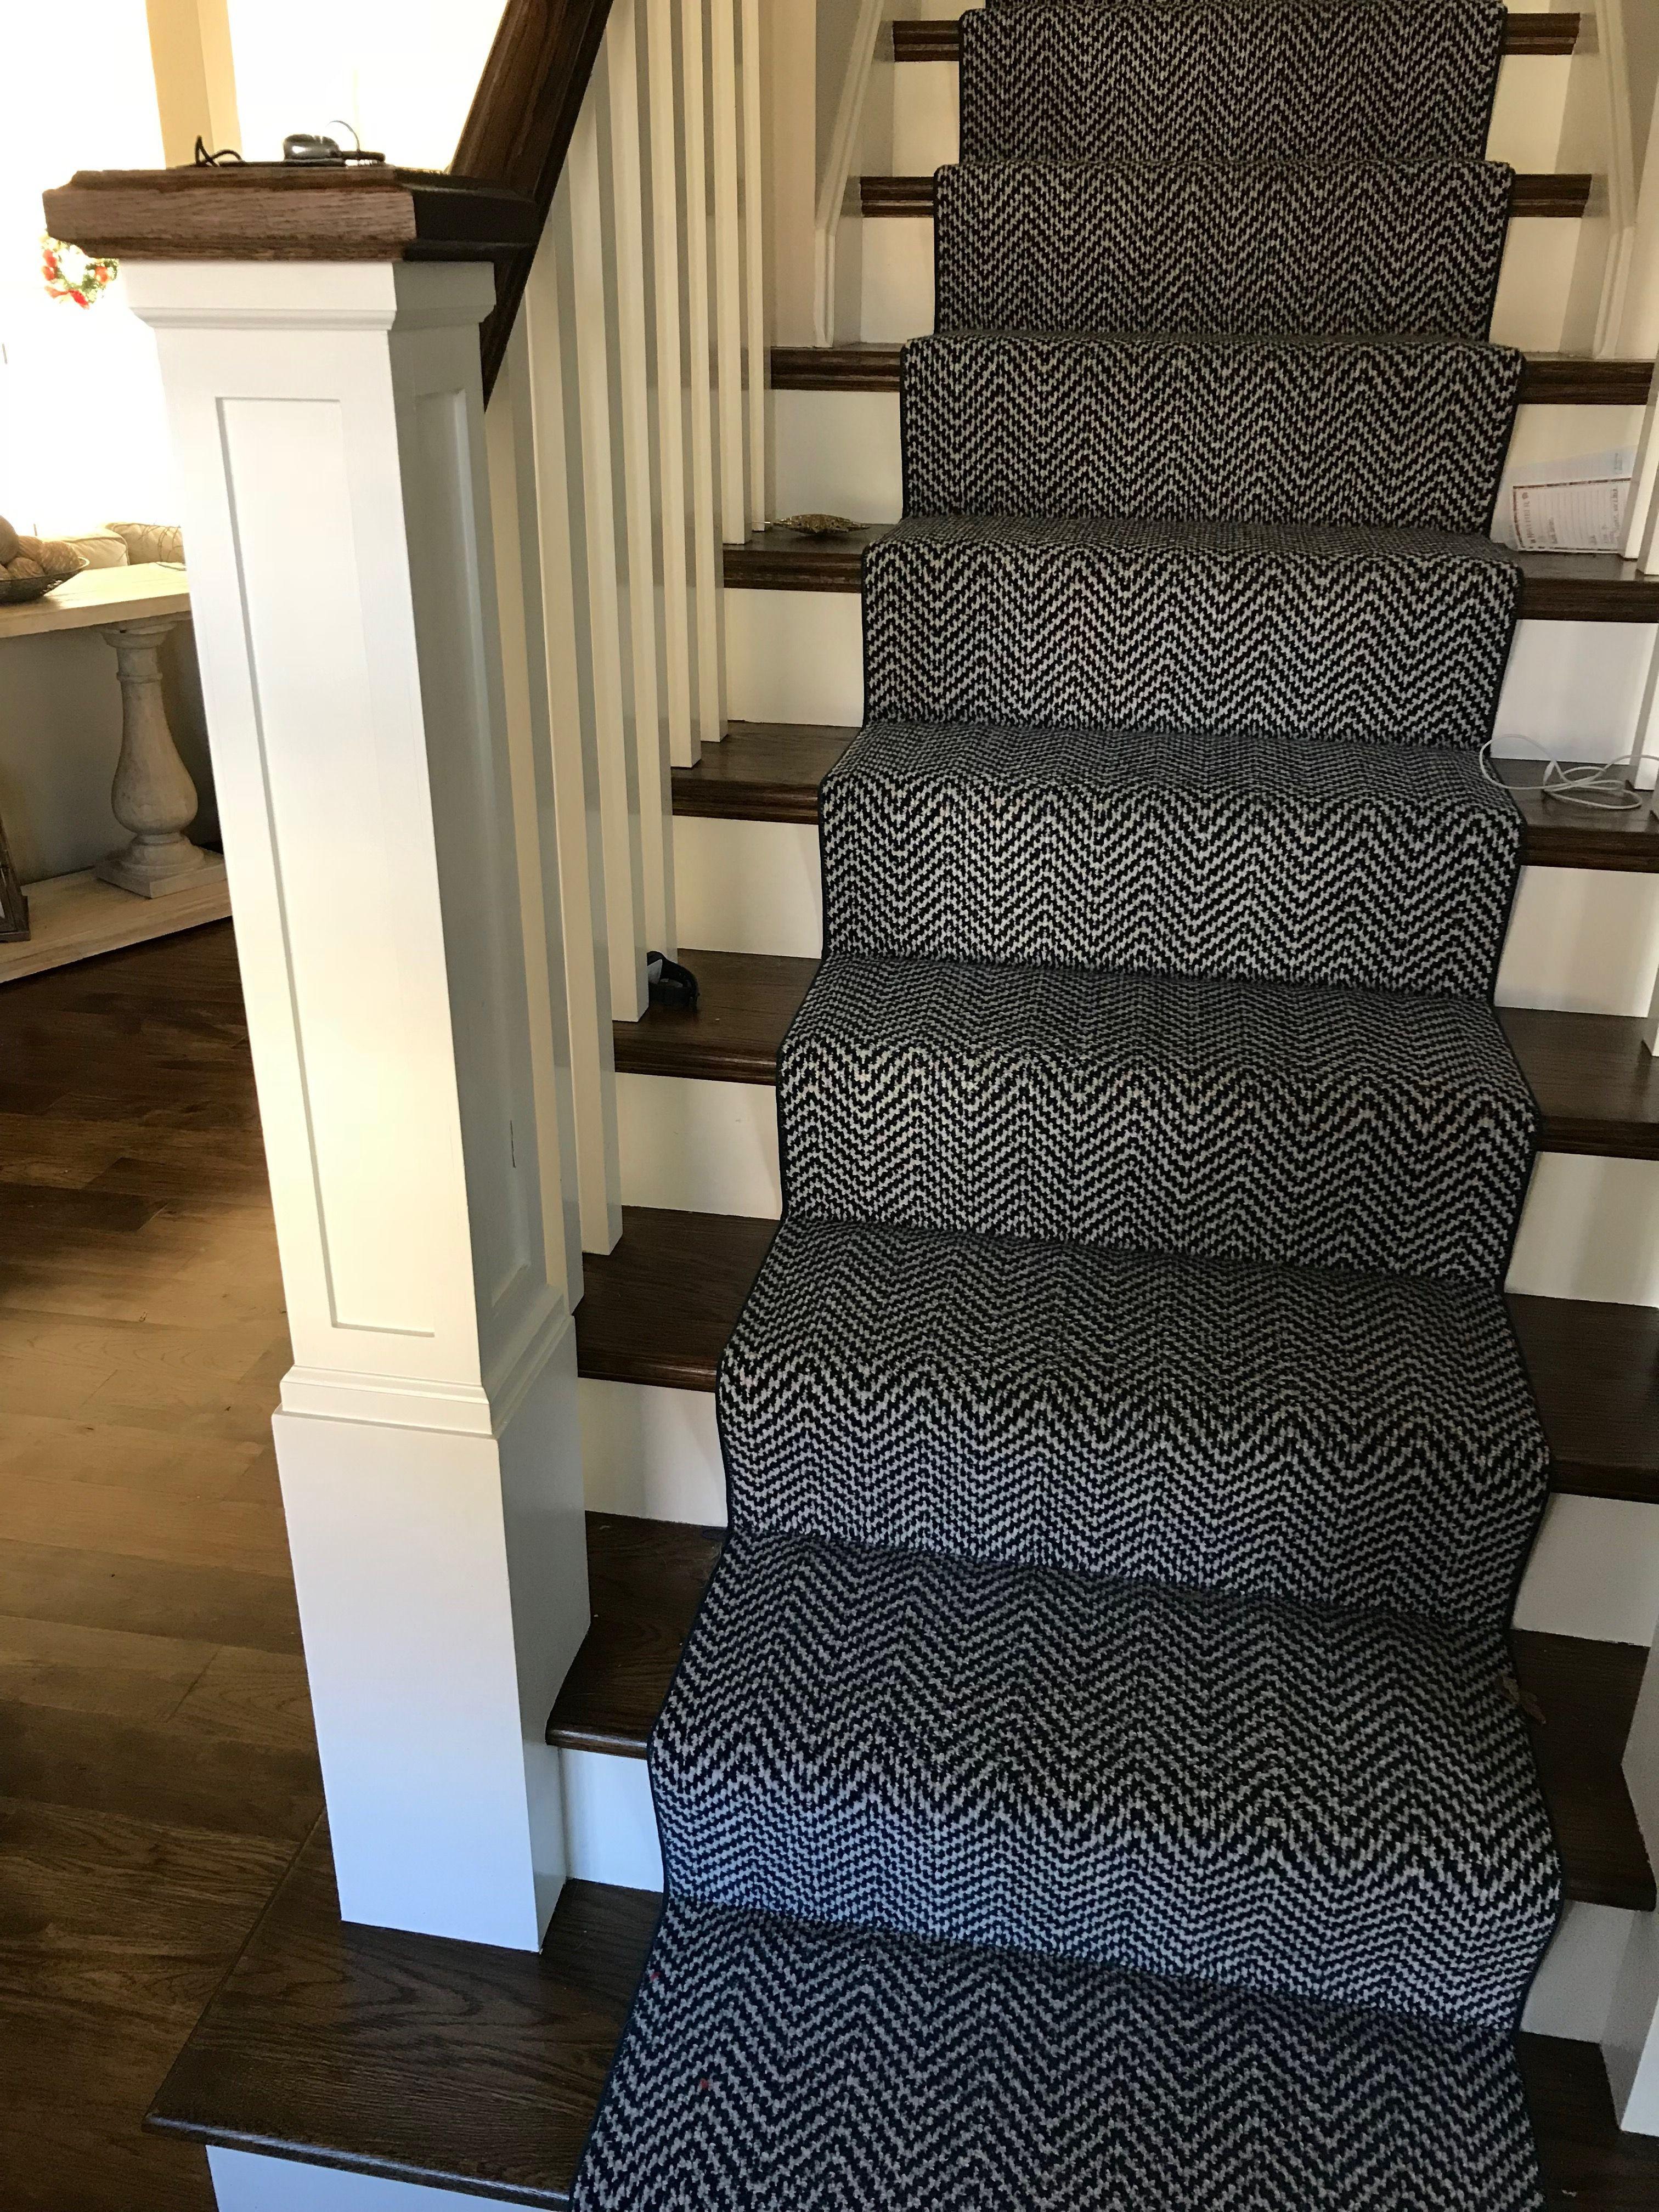 hardwood floor stairs slippery of pin by jenine hanson on basement pinterest stairways basements for stairways basements ladders stairs staircases basement